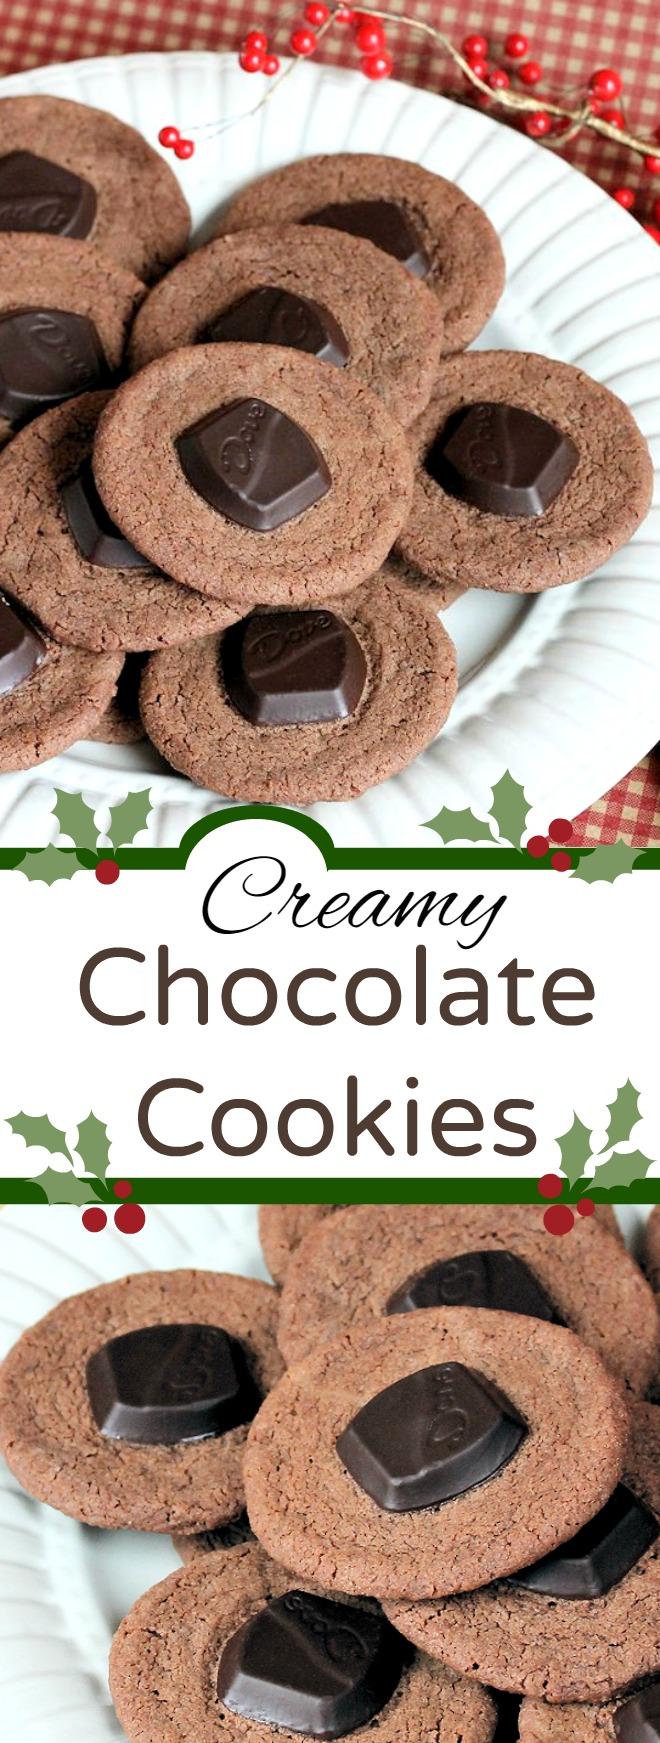 Creamy Chocolate Cookies